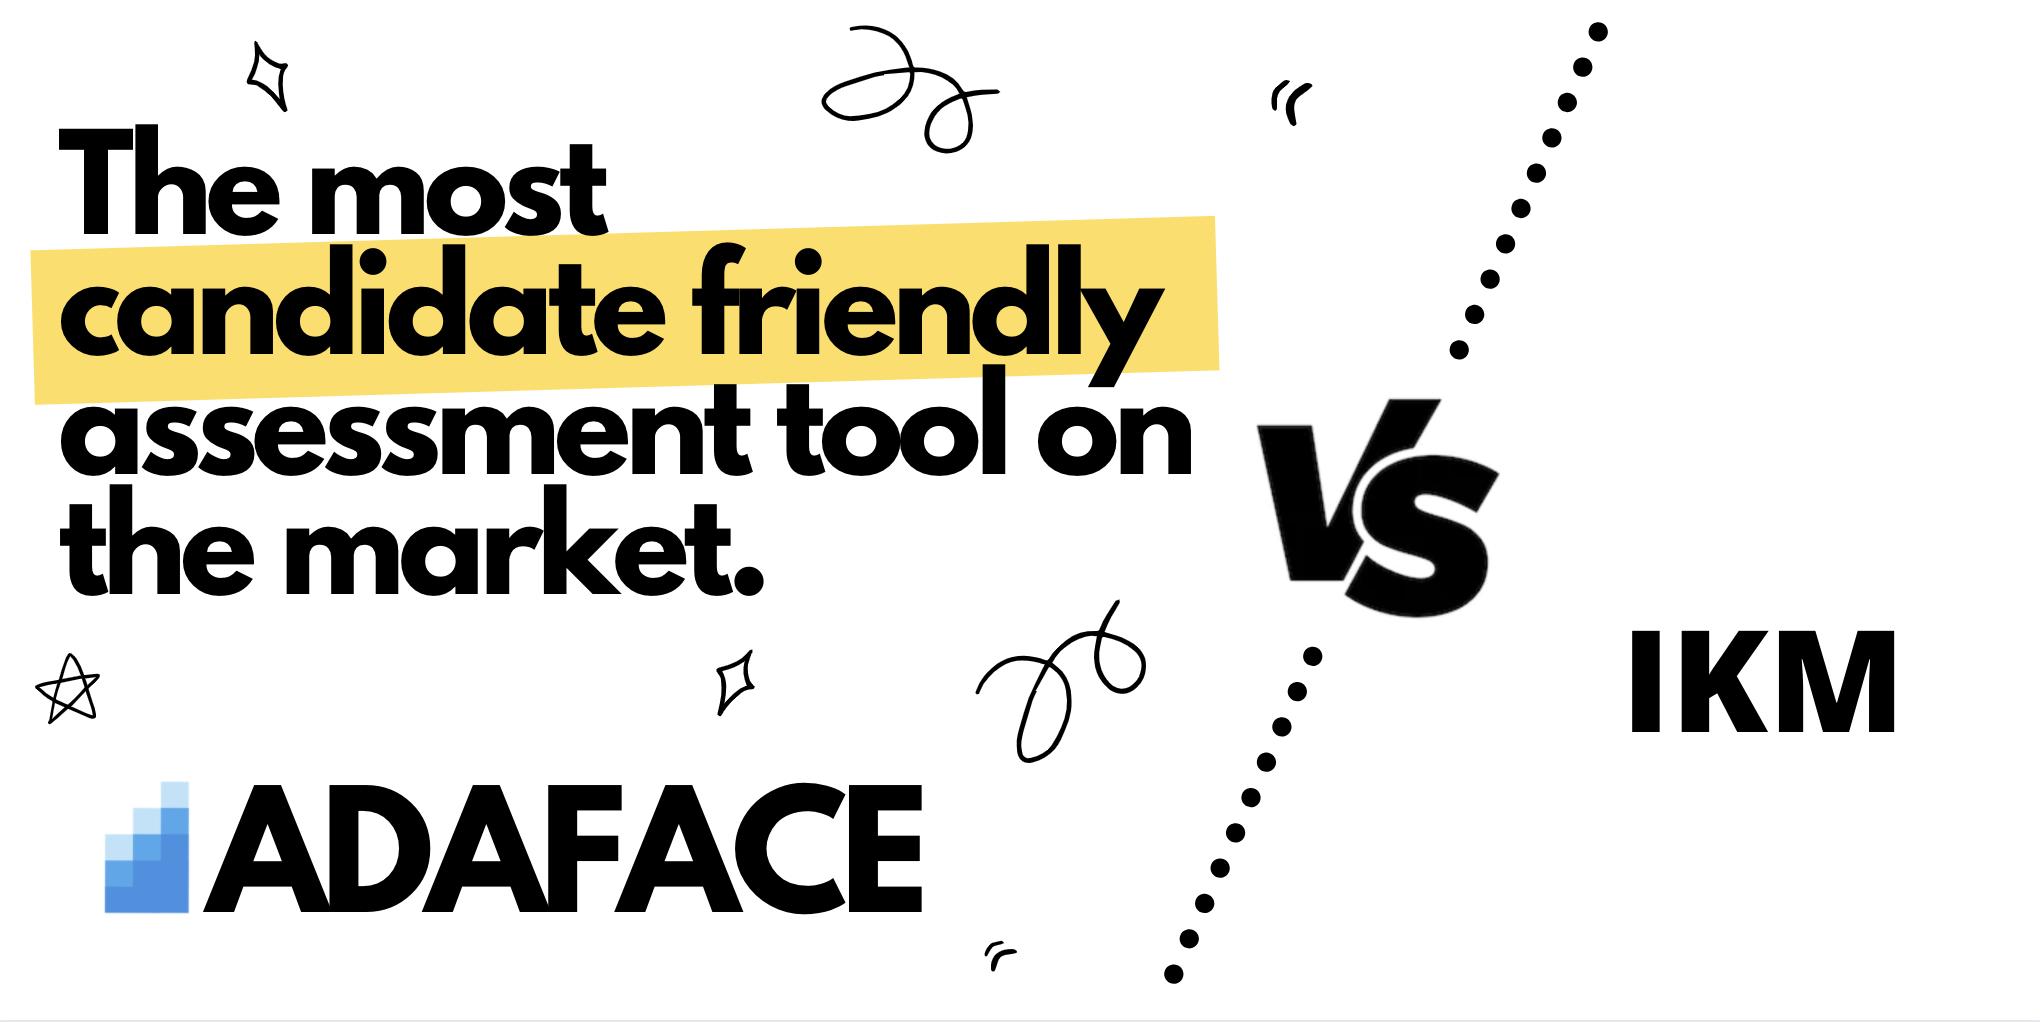 IKM vs Adaface image